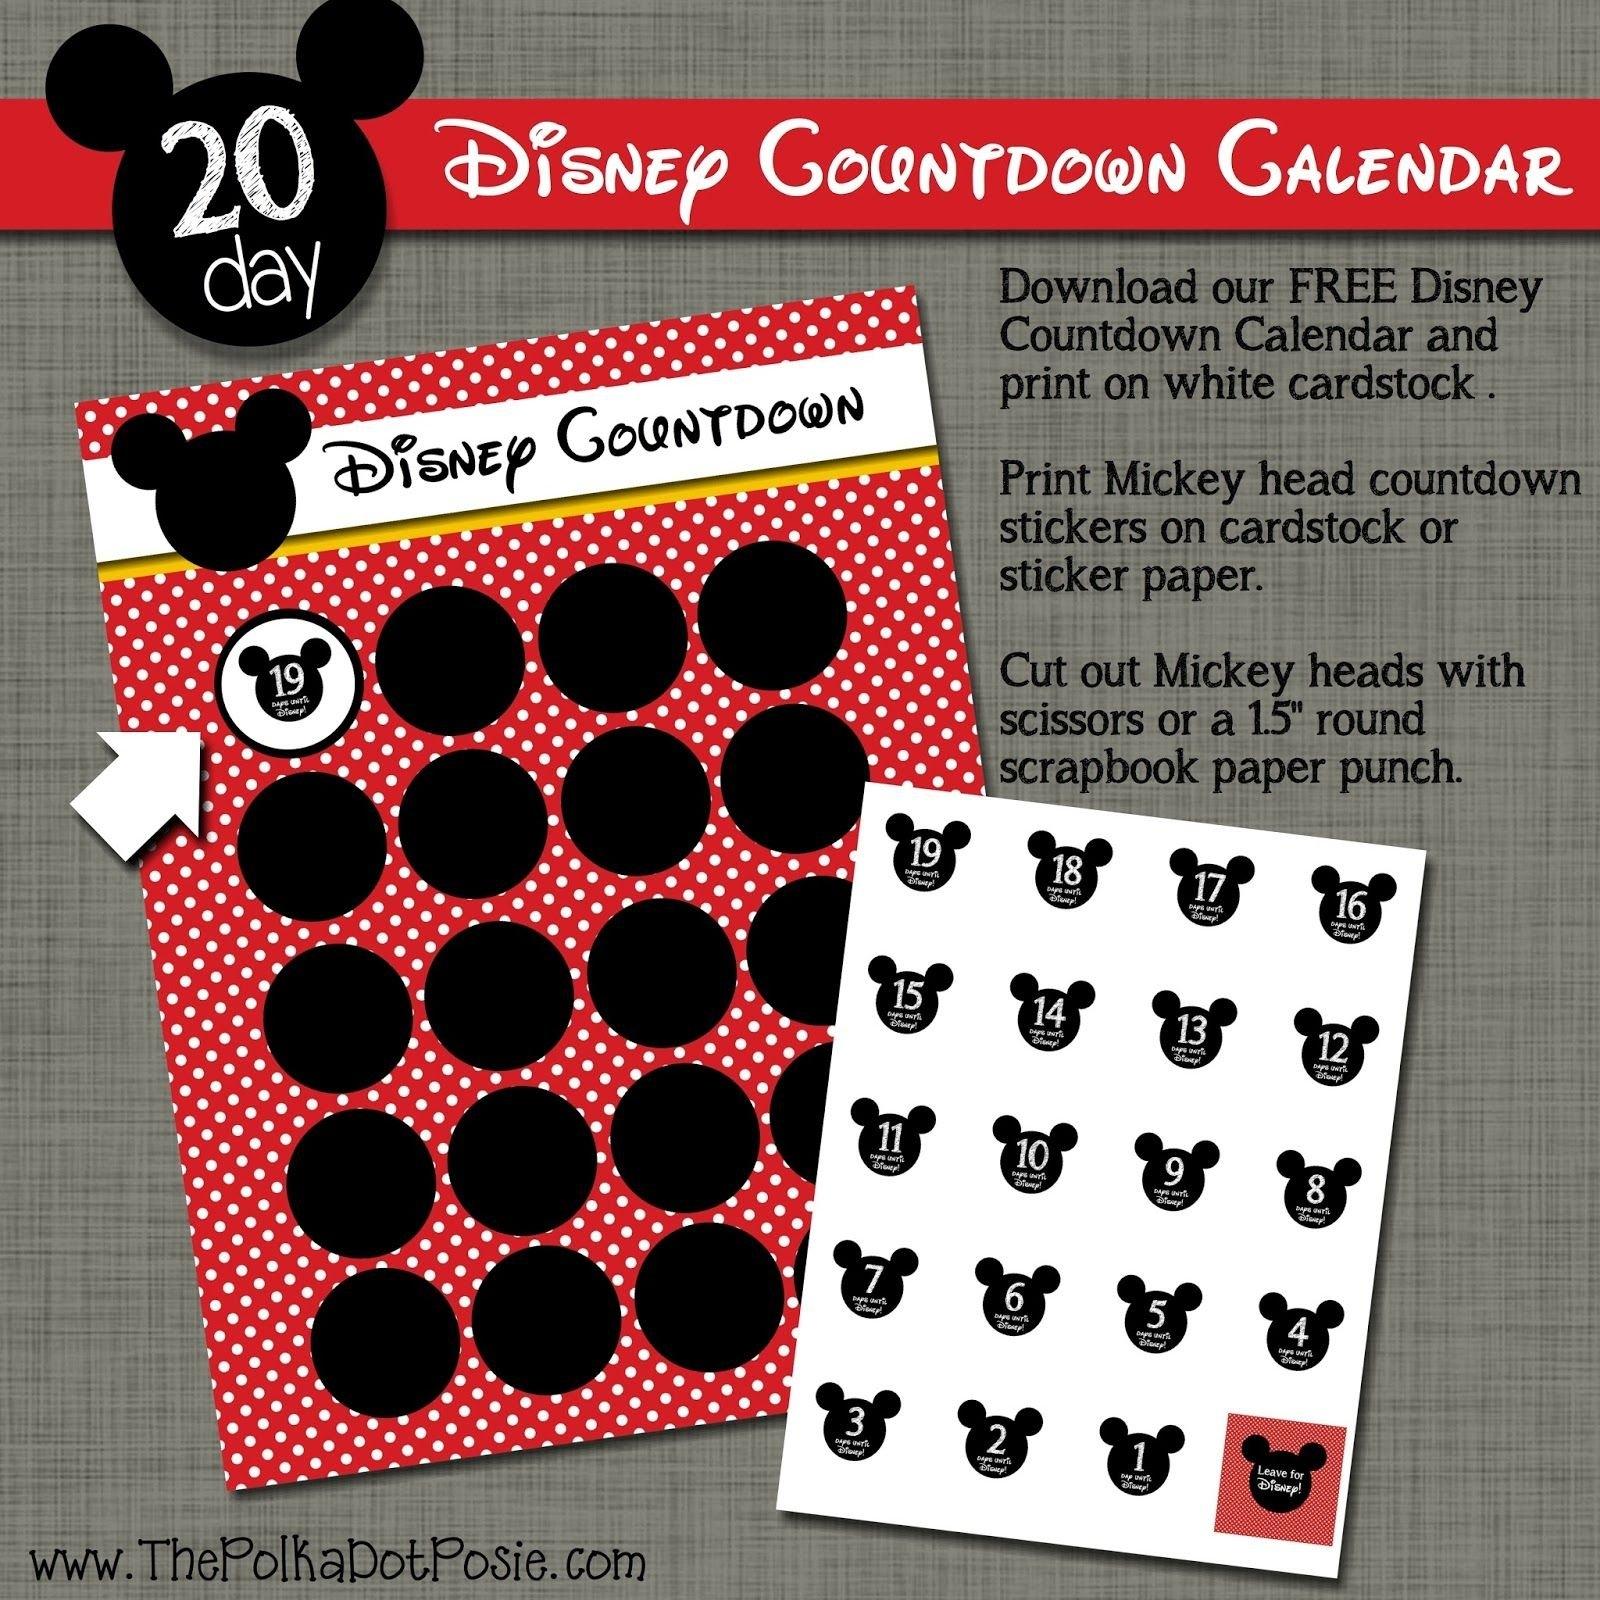 The Polka Dot Posie: Free Disney Countdown Sticker Calendar | Disney Countdown throughout 180 Day Countdown Calendar Graphics